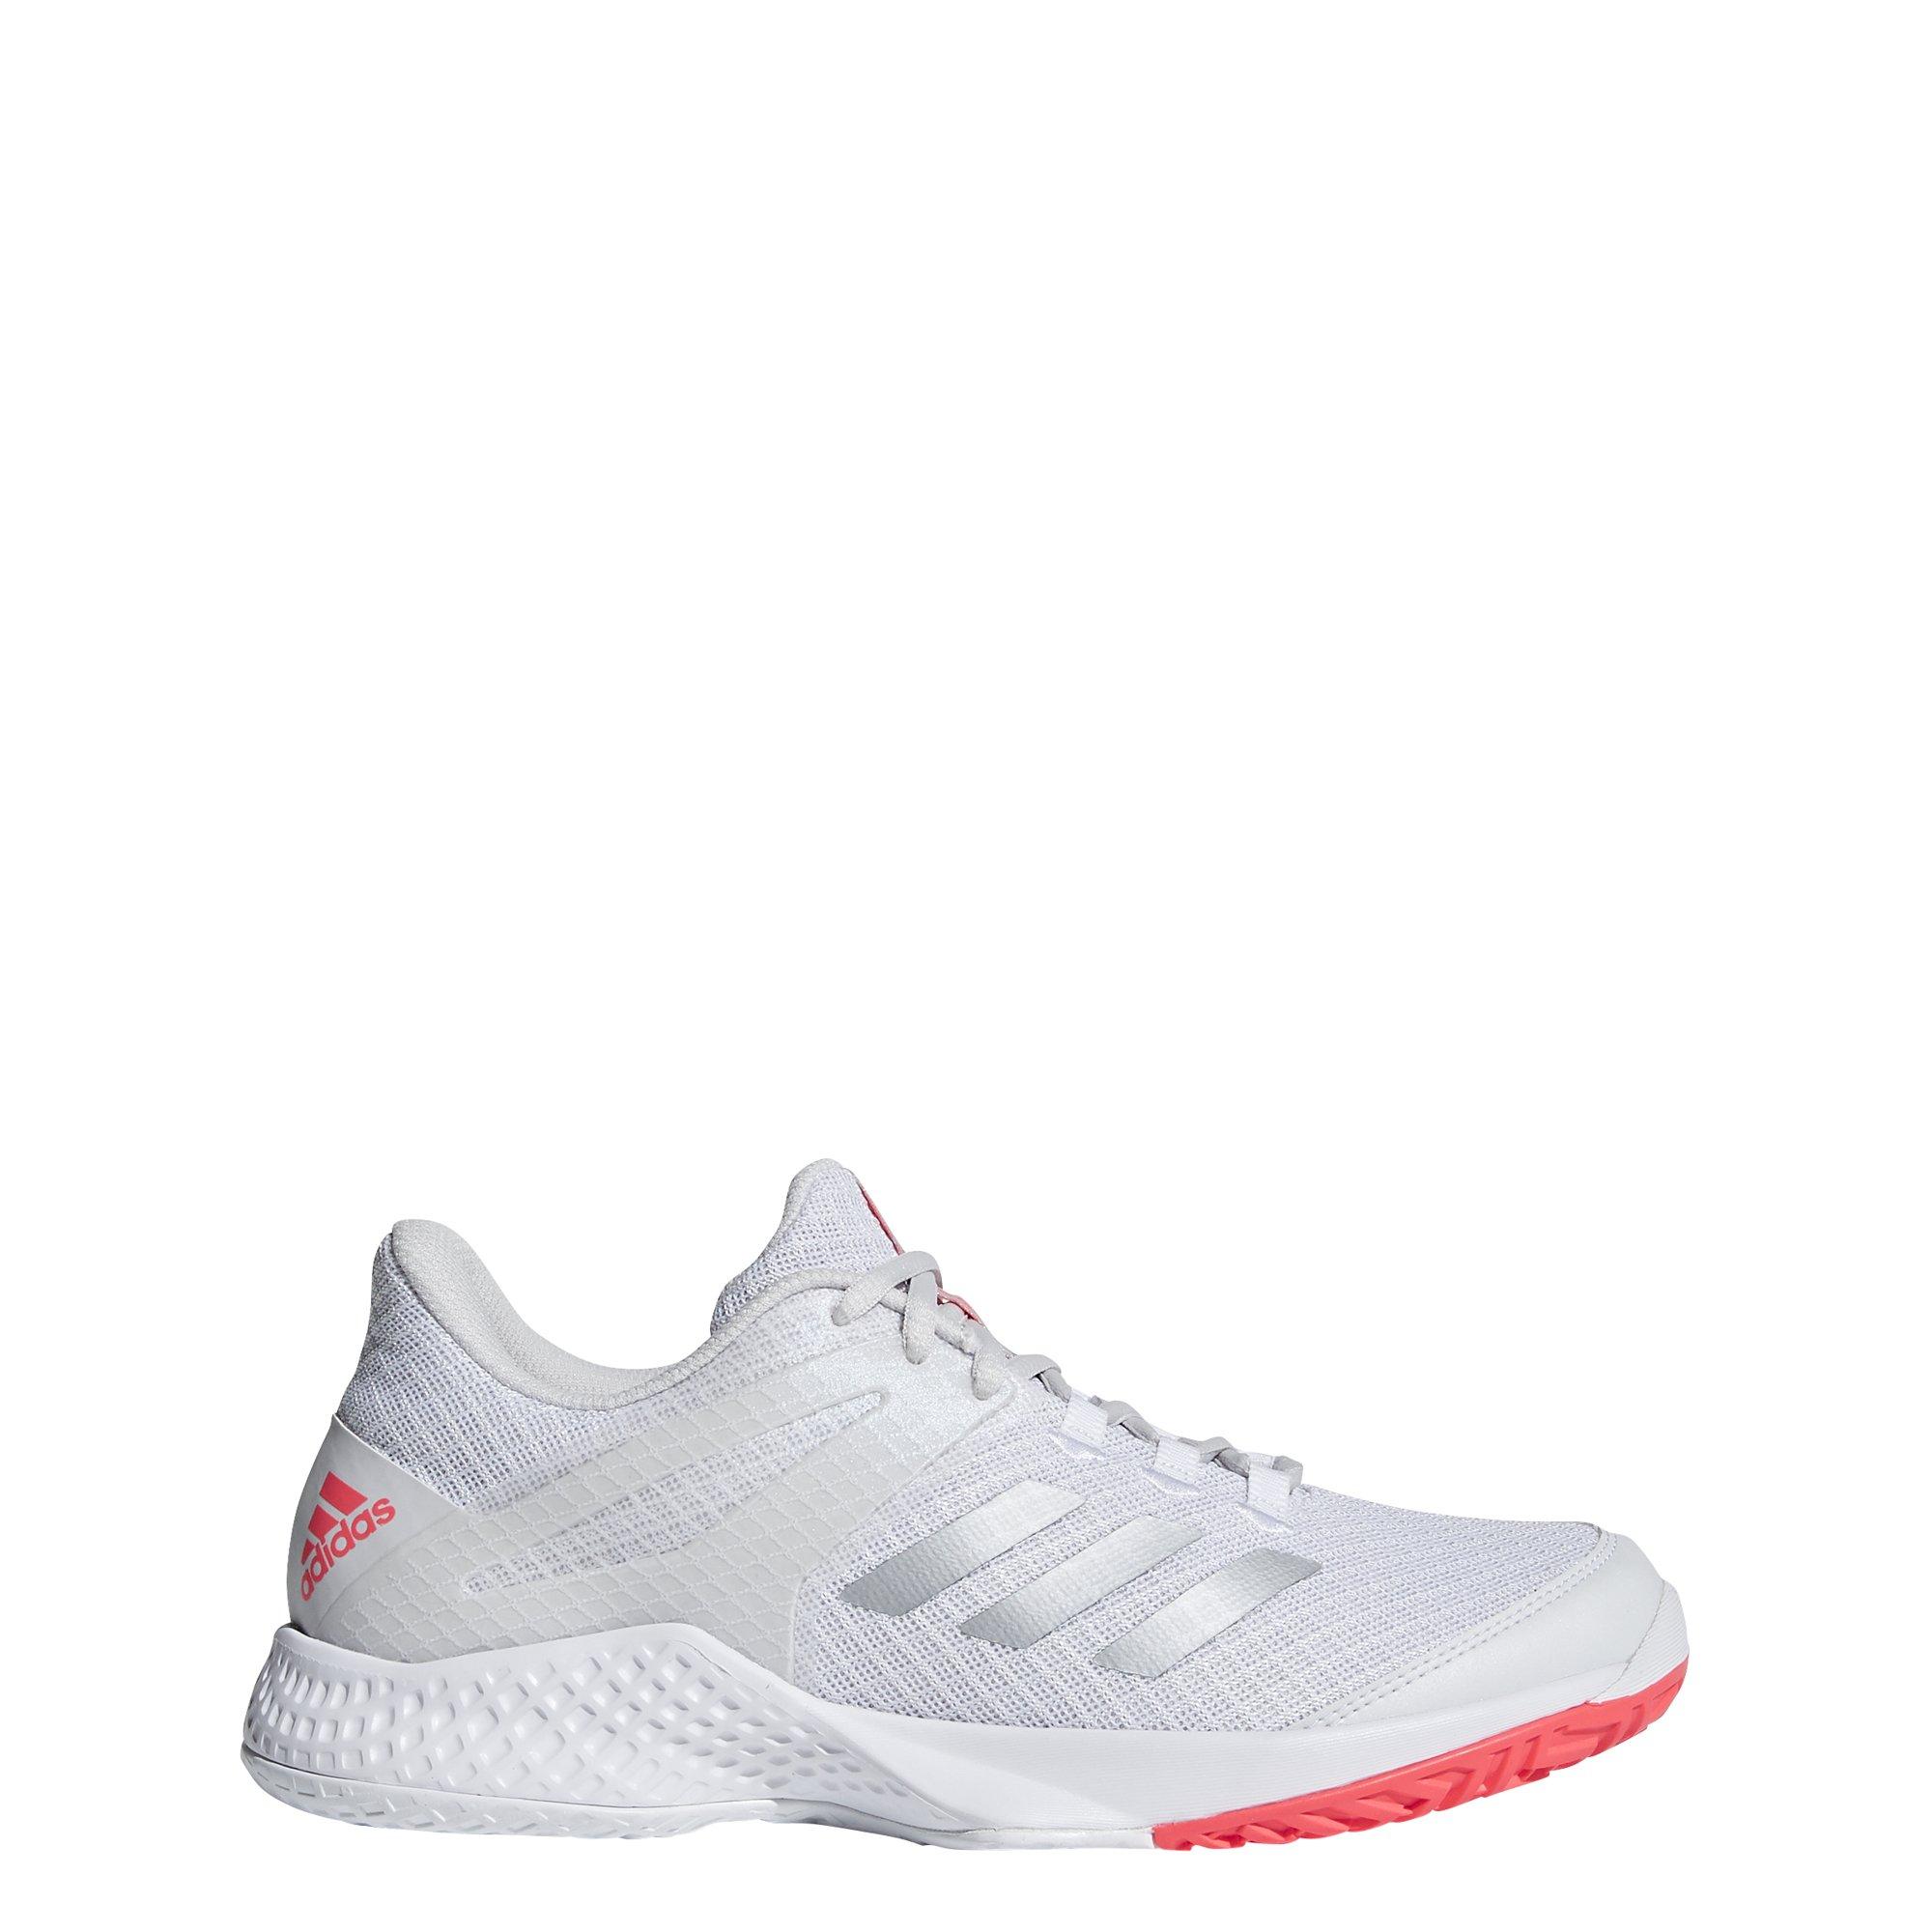 adidas Women's Adizero Club 2 Tennis Shoe, White/Matte Silver/Grey, 8.5 M US